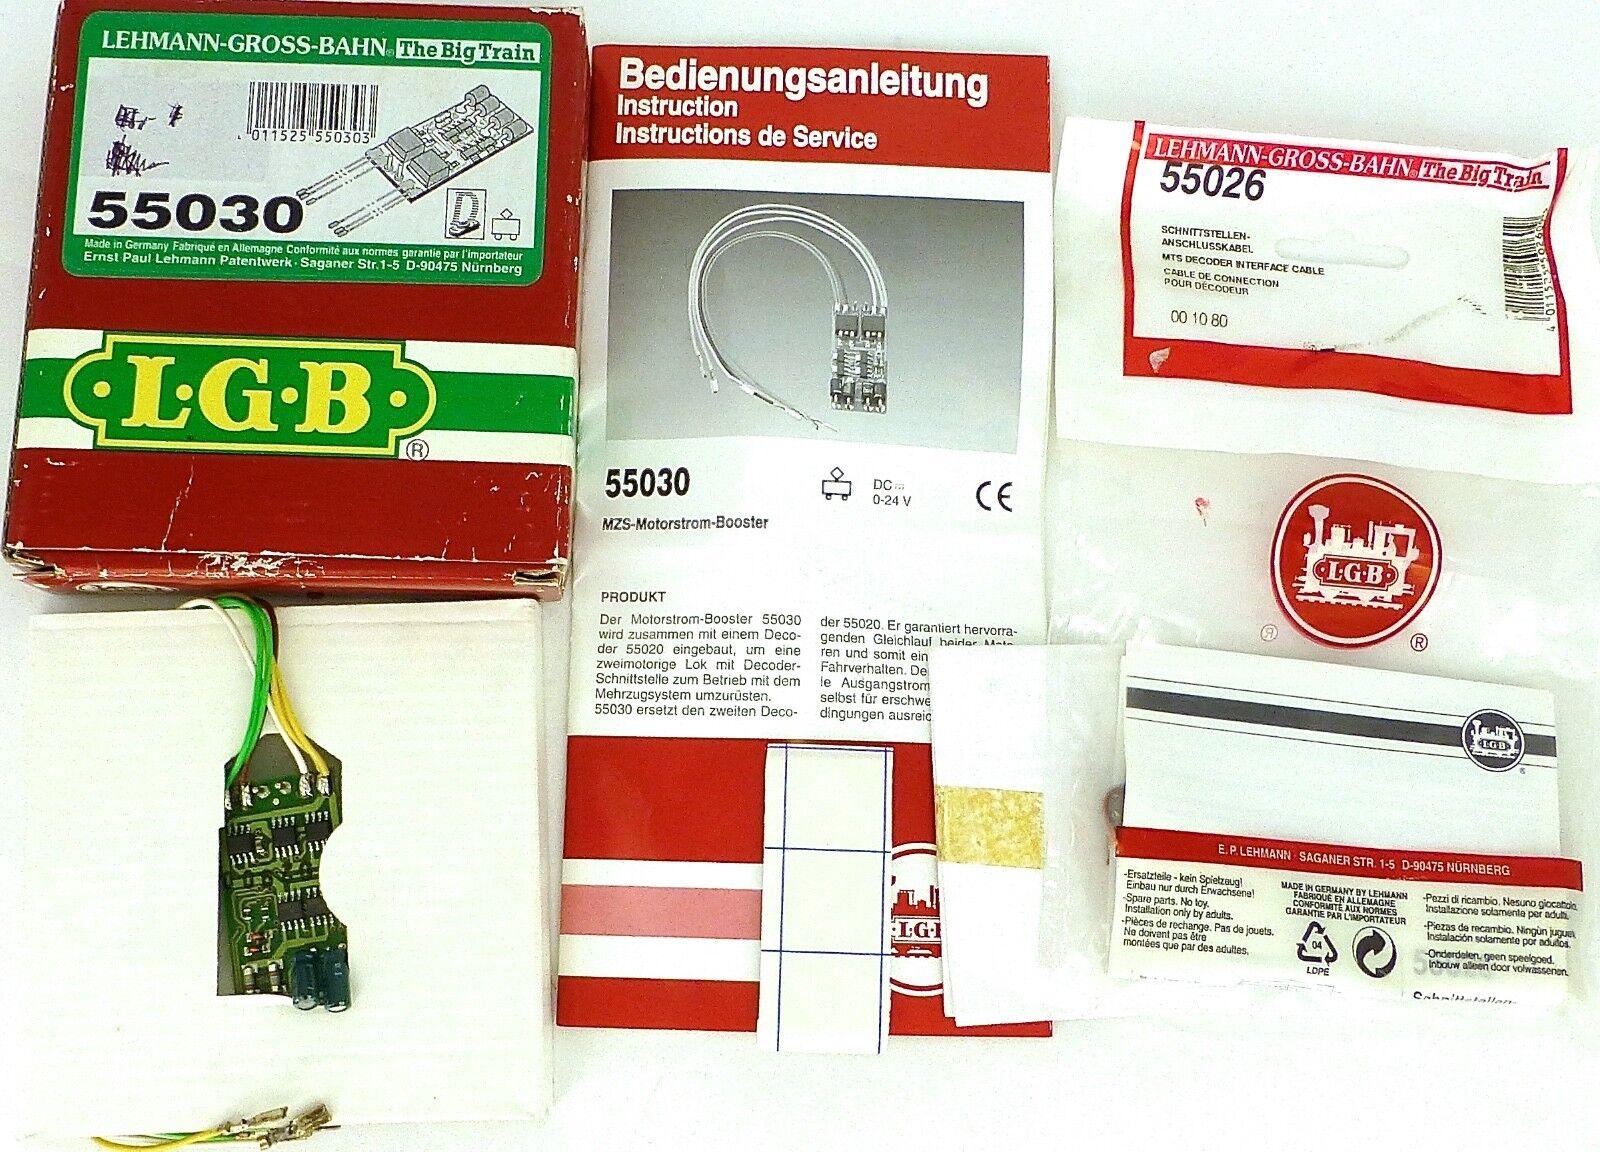 LGB 5030 mzb MOTORE elettricità BOOSTER Lehmann + 55026 Anschlußkabel OVP µ *